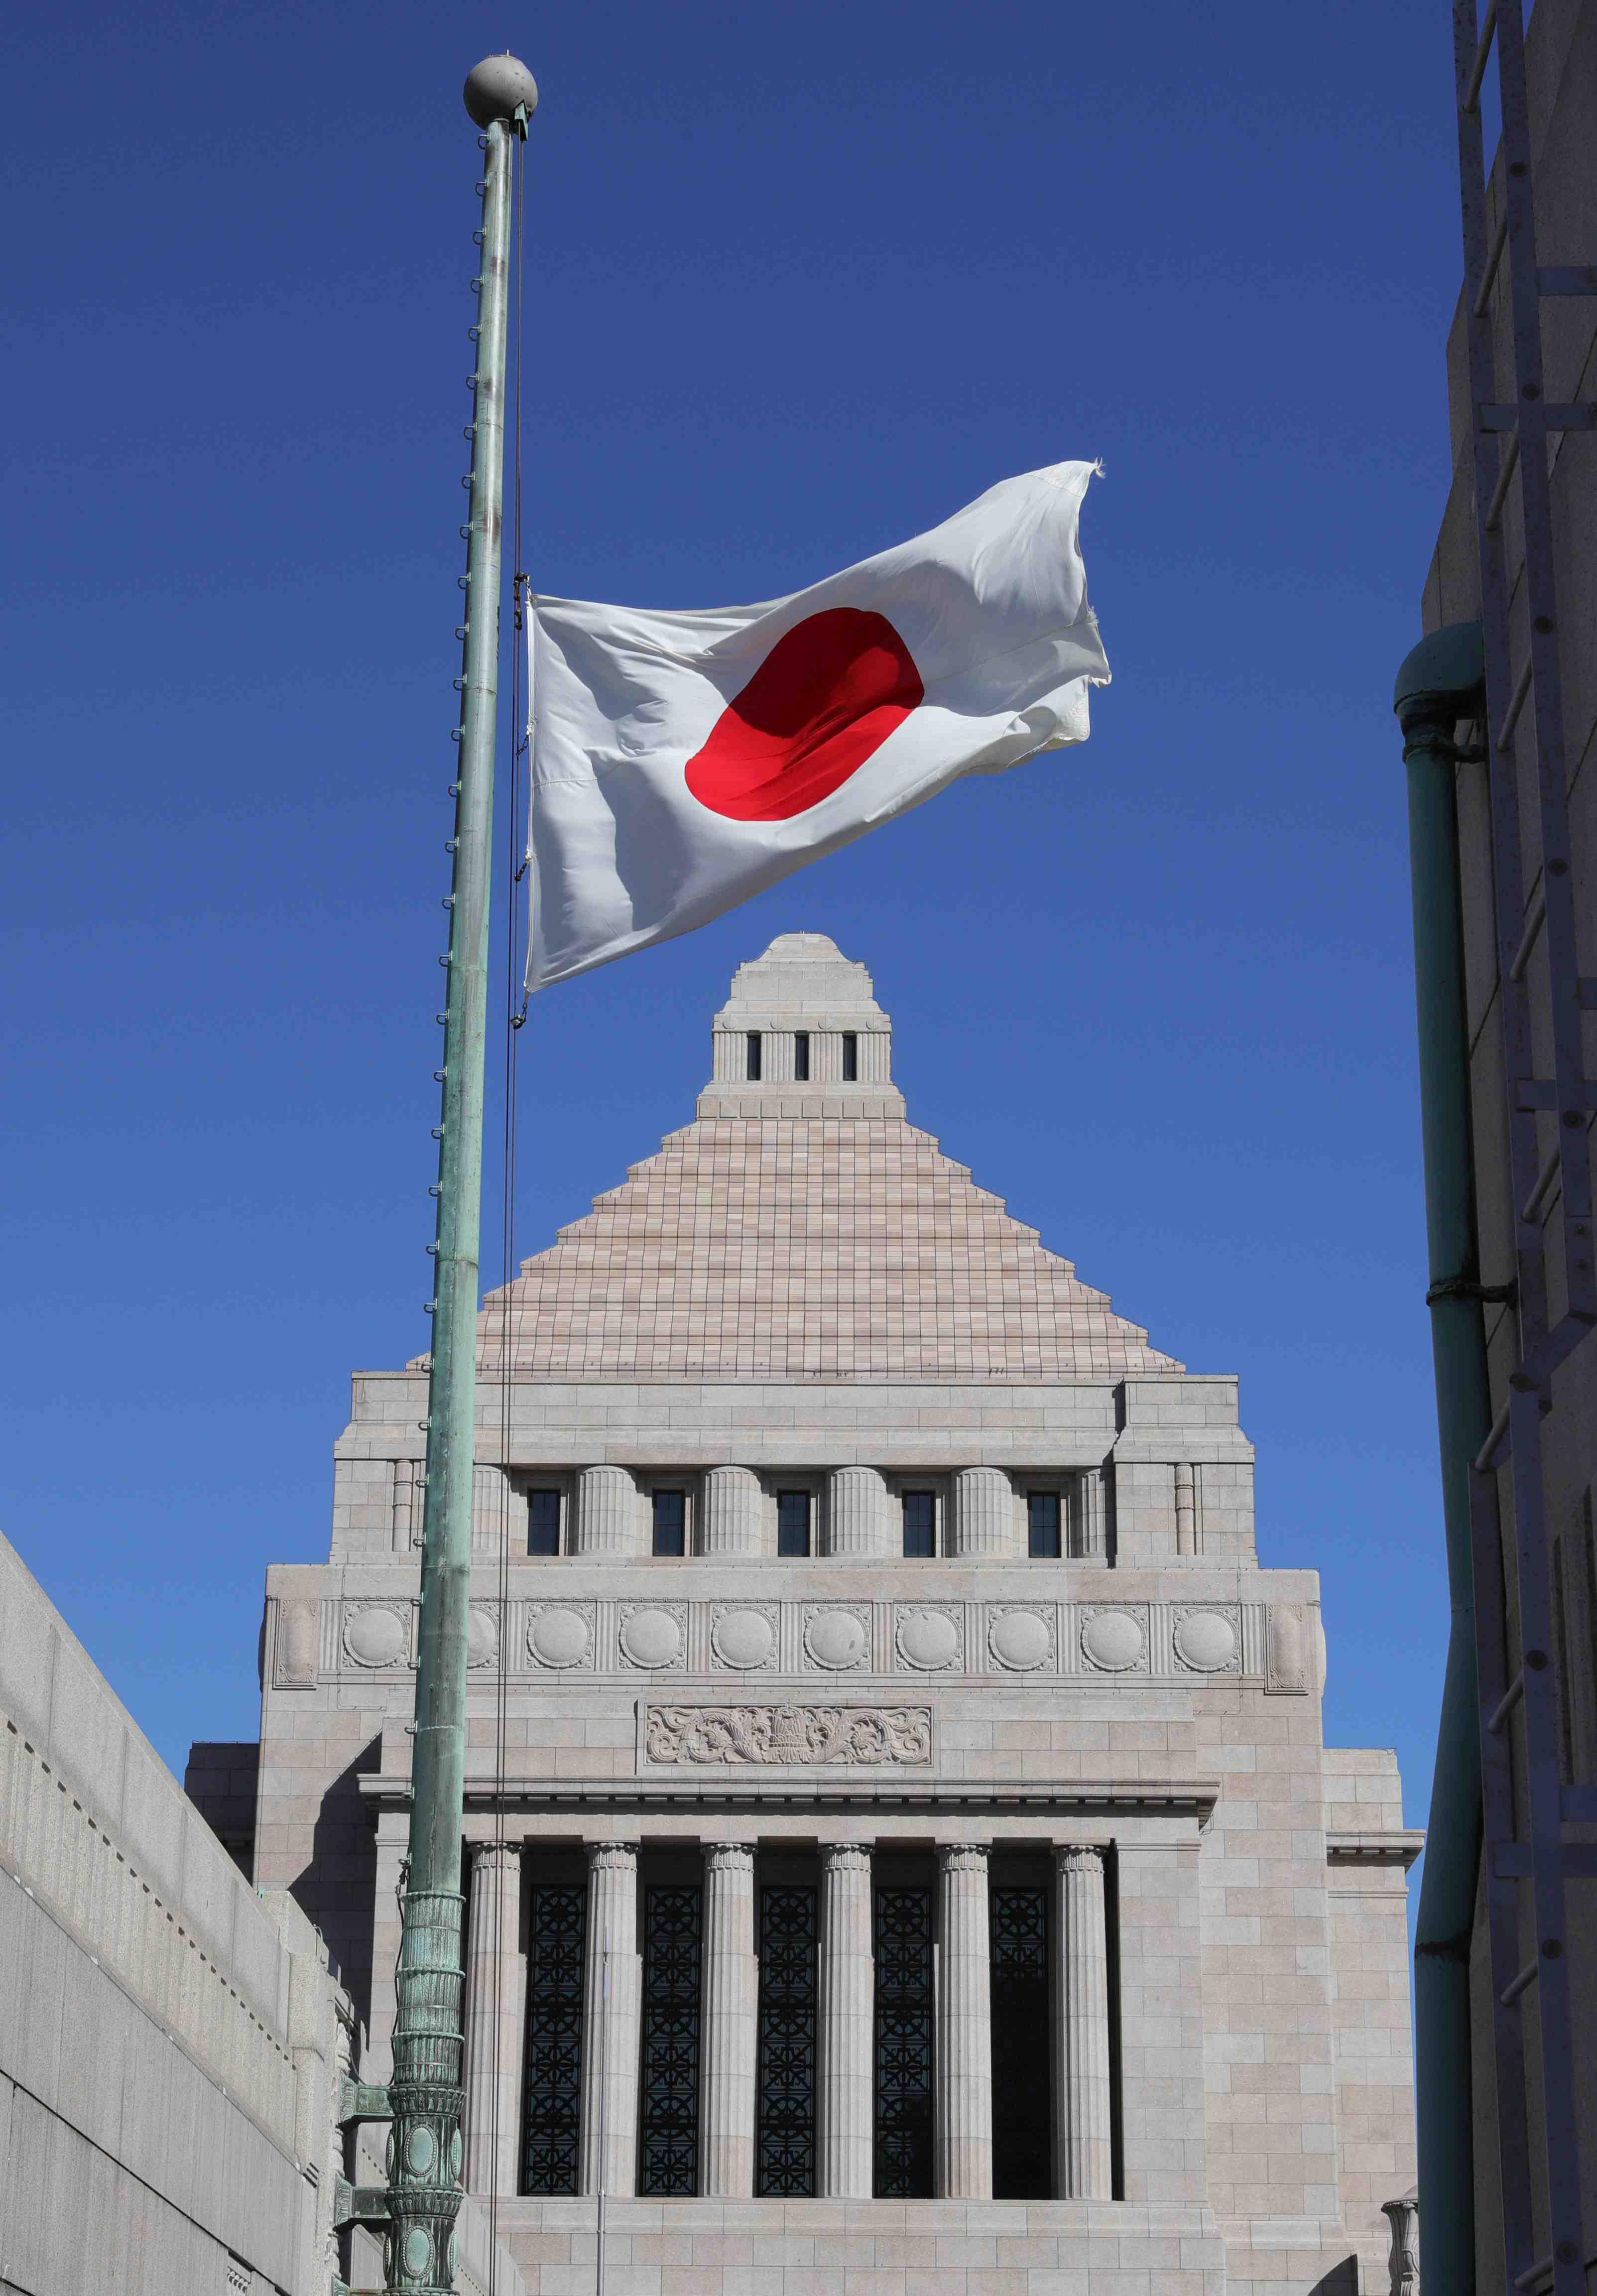 Japan 3.11 Anniversary The Great Tohoku Earthquake